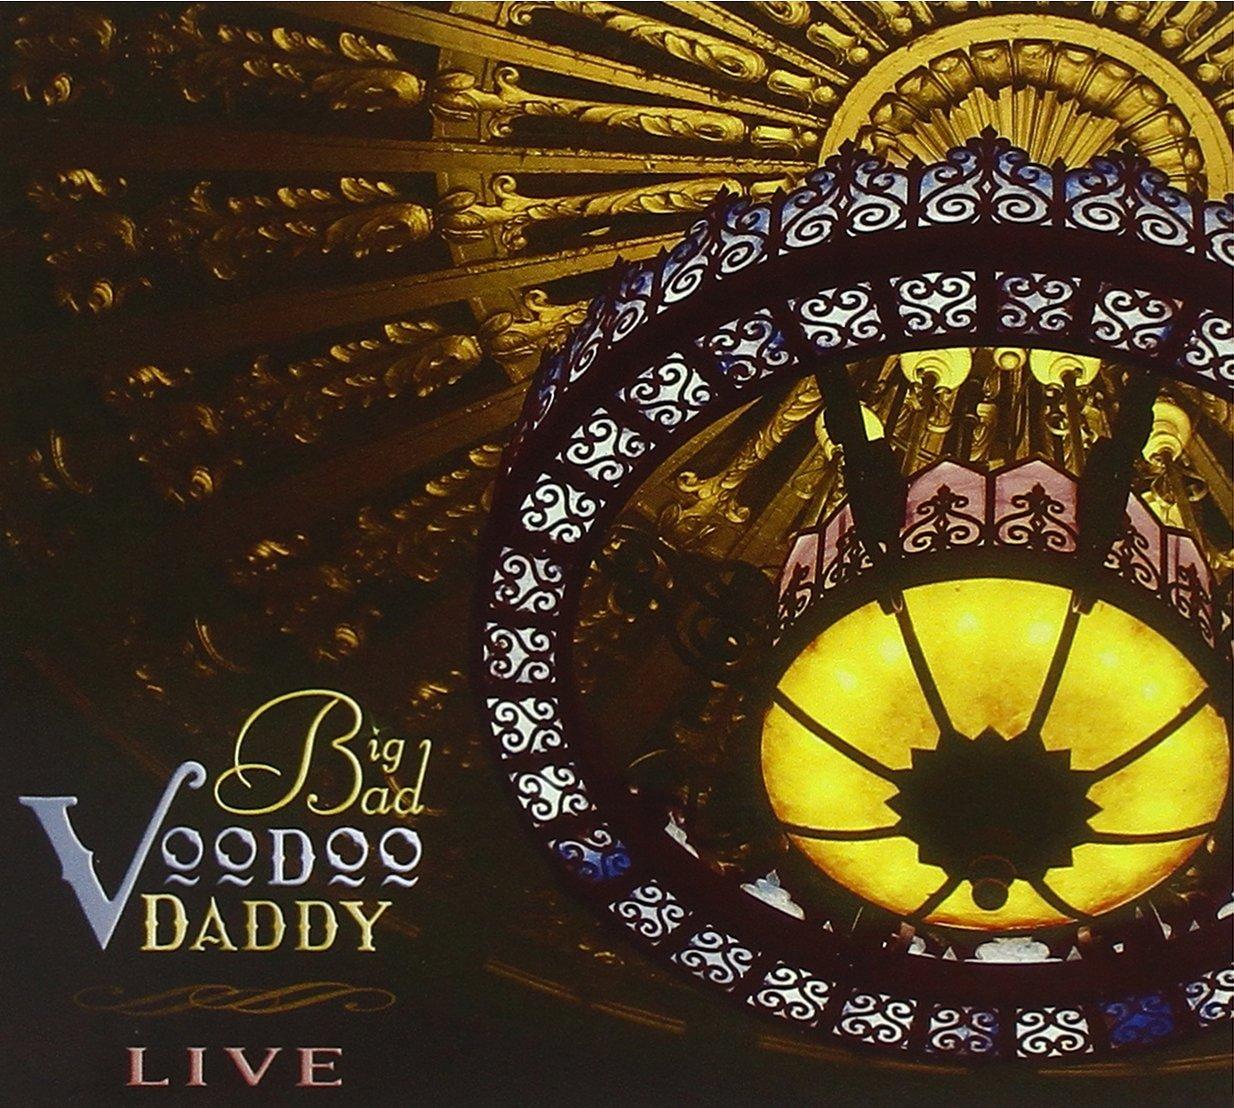 Live (Includes Bonus DVD) by Emm/Big Bad Records